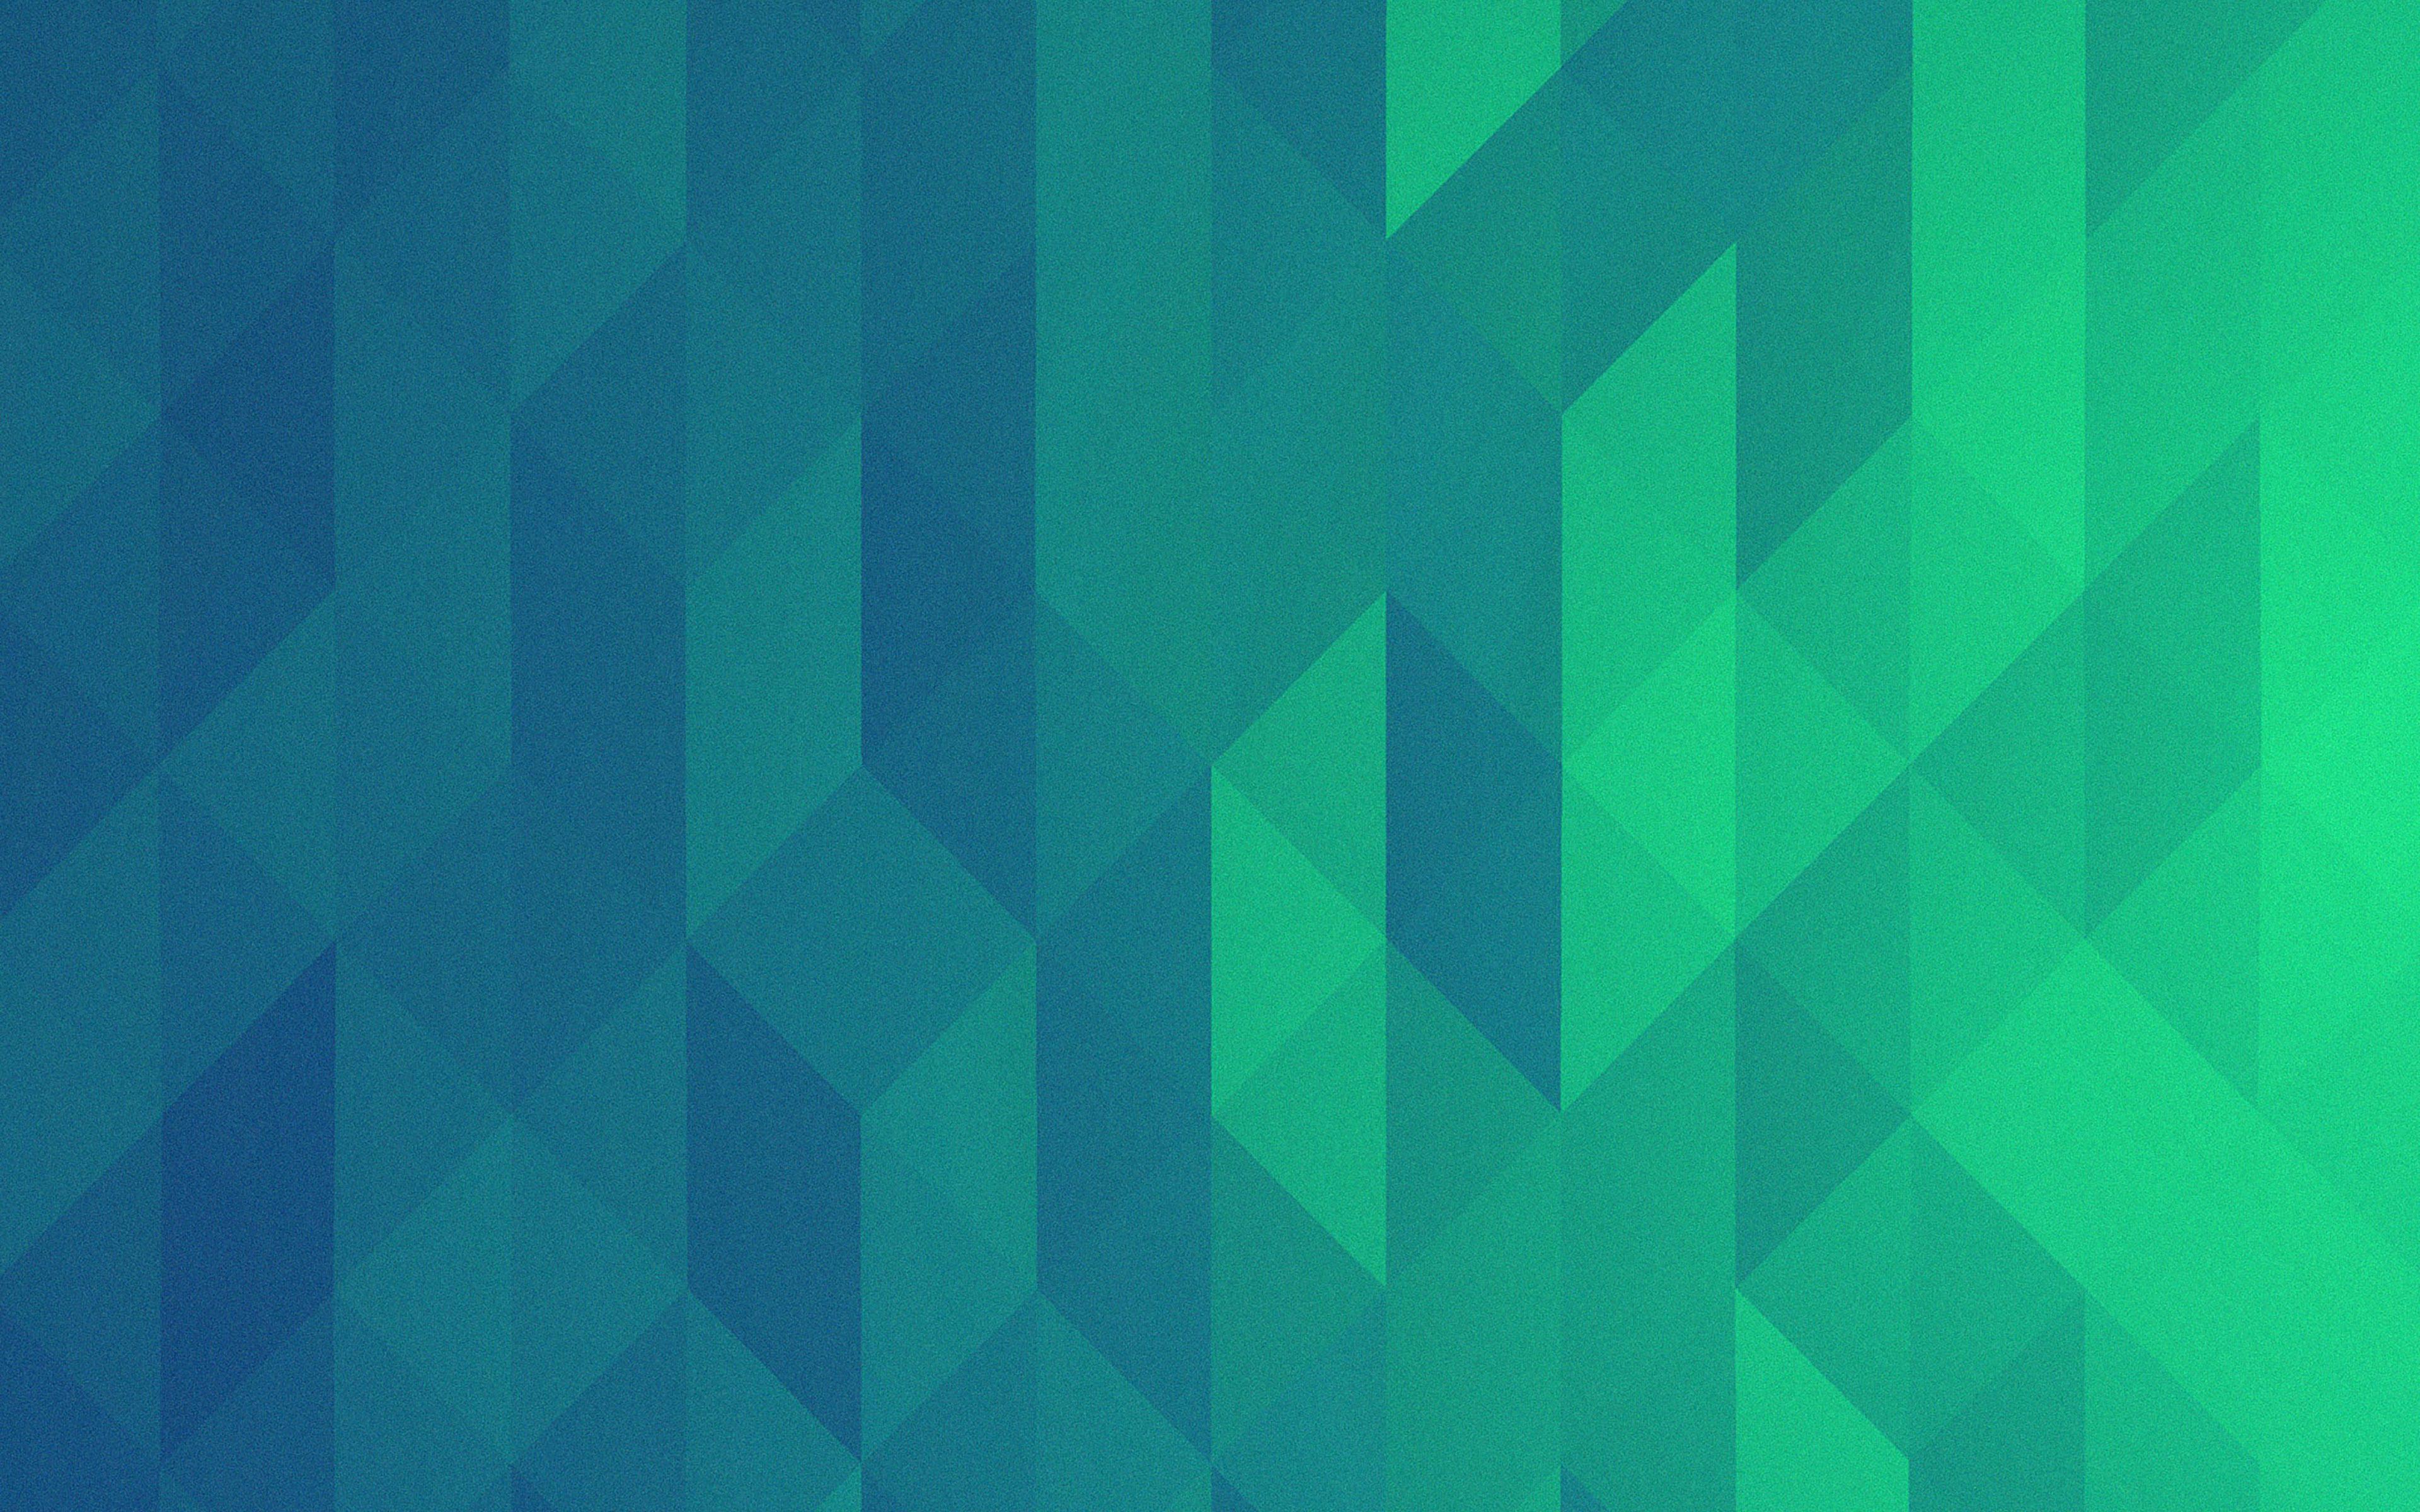 Blue Green Purple Galaxy Bedding: Wallpaper For Desktop, Laptop